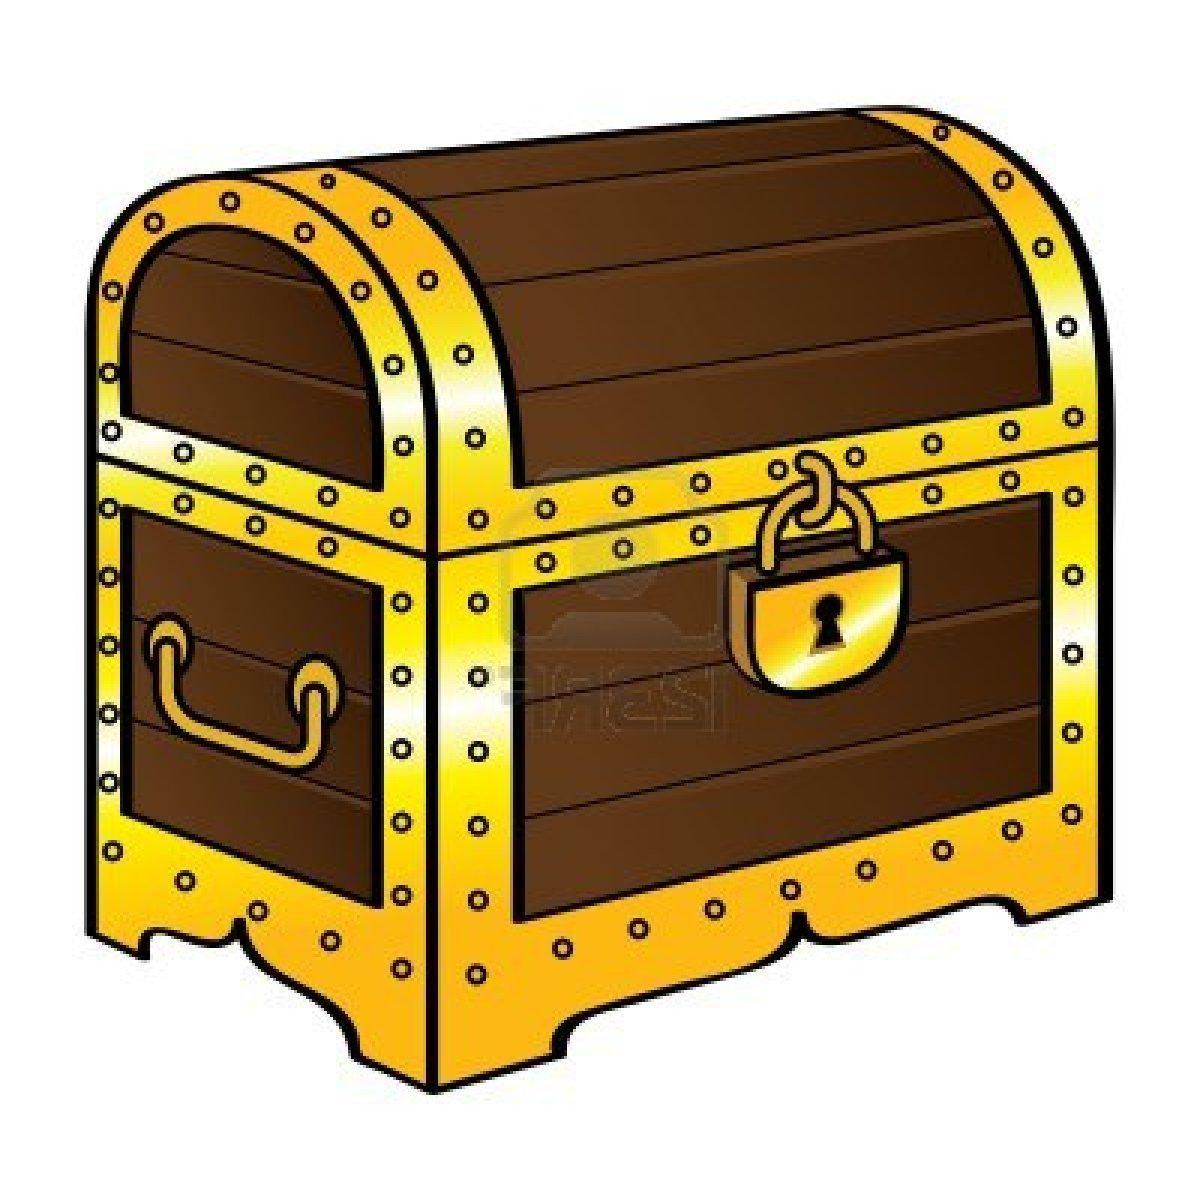 Free Treasure Chest Clipart: Treasure Box Clipart At GetDrawings.com